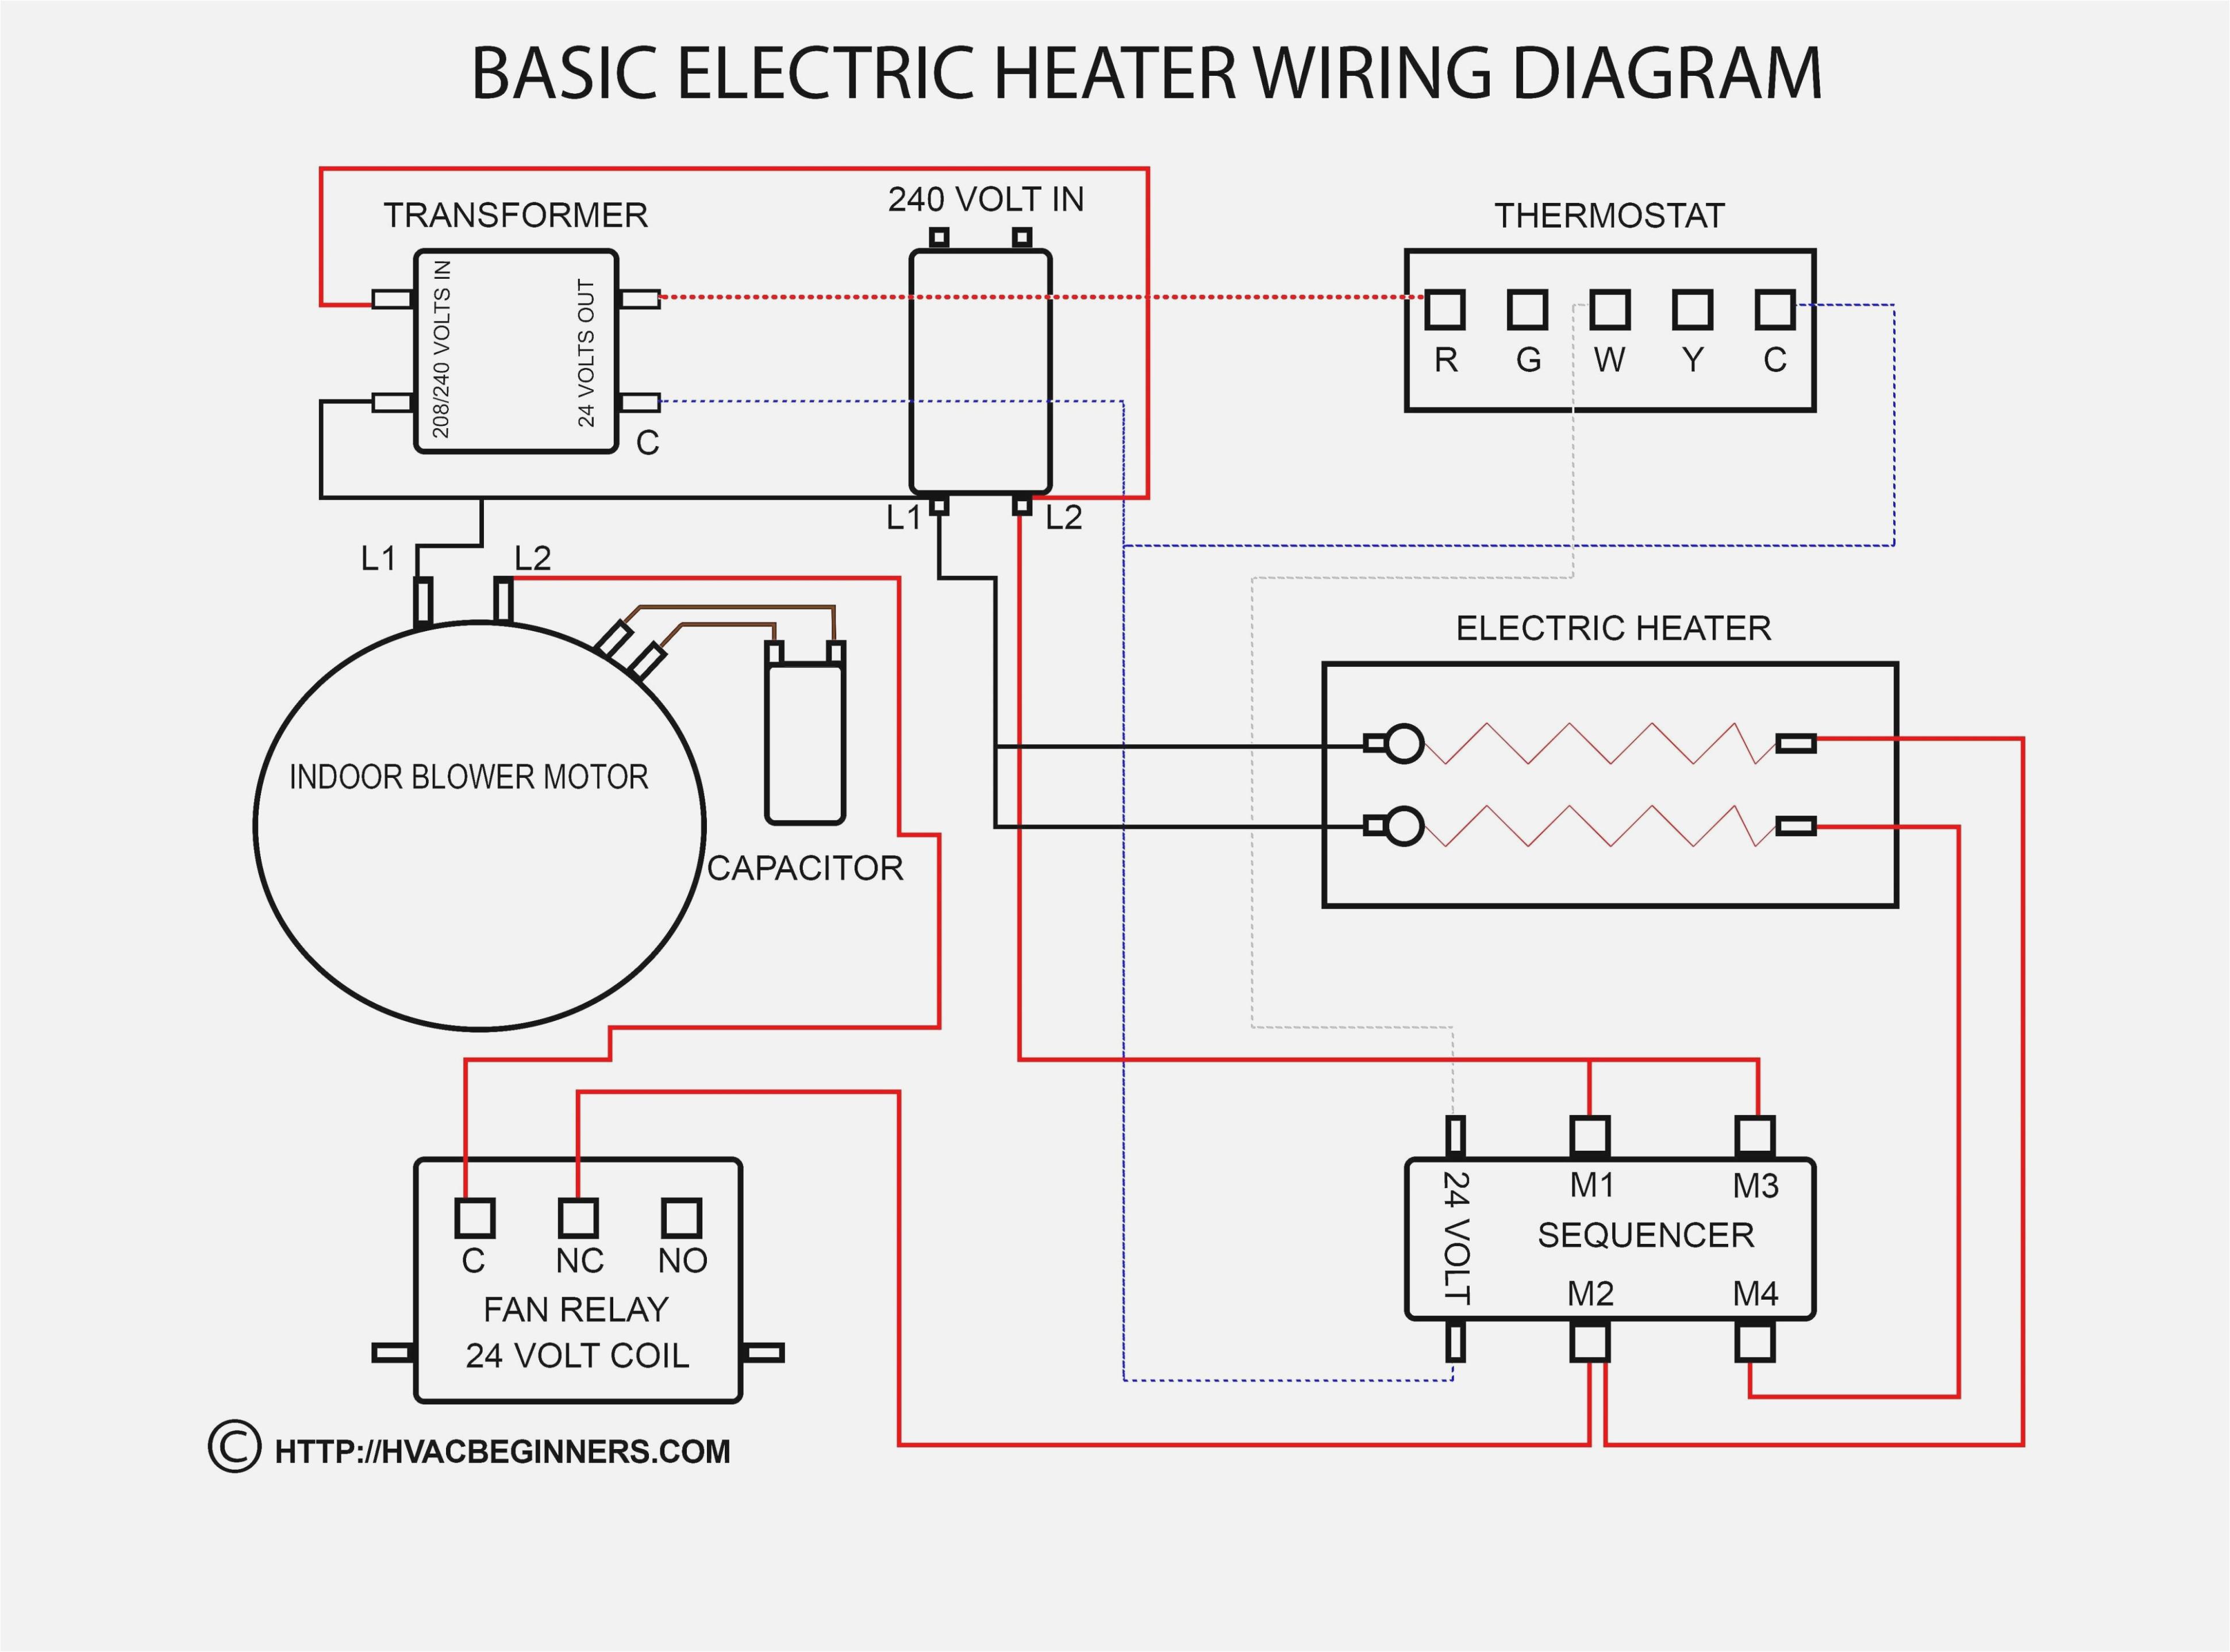 115v breaker wiring diagram free picture schematic wiring diagram ame 115v breaker wiring diagram